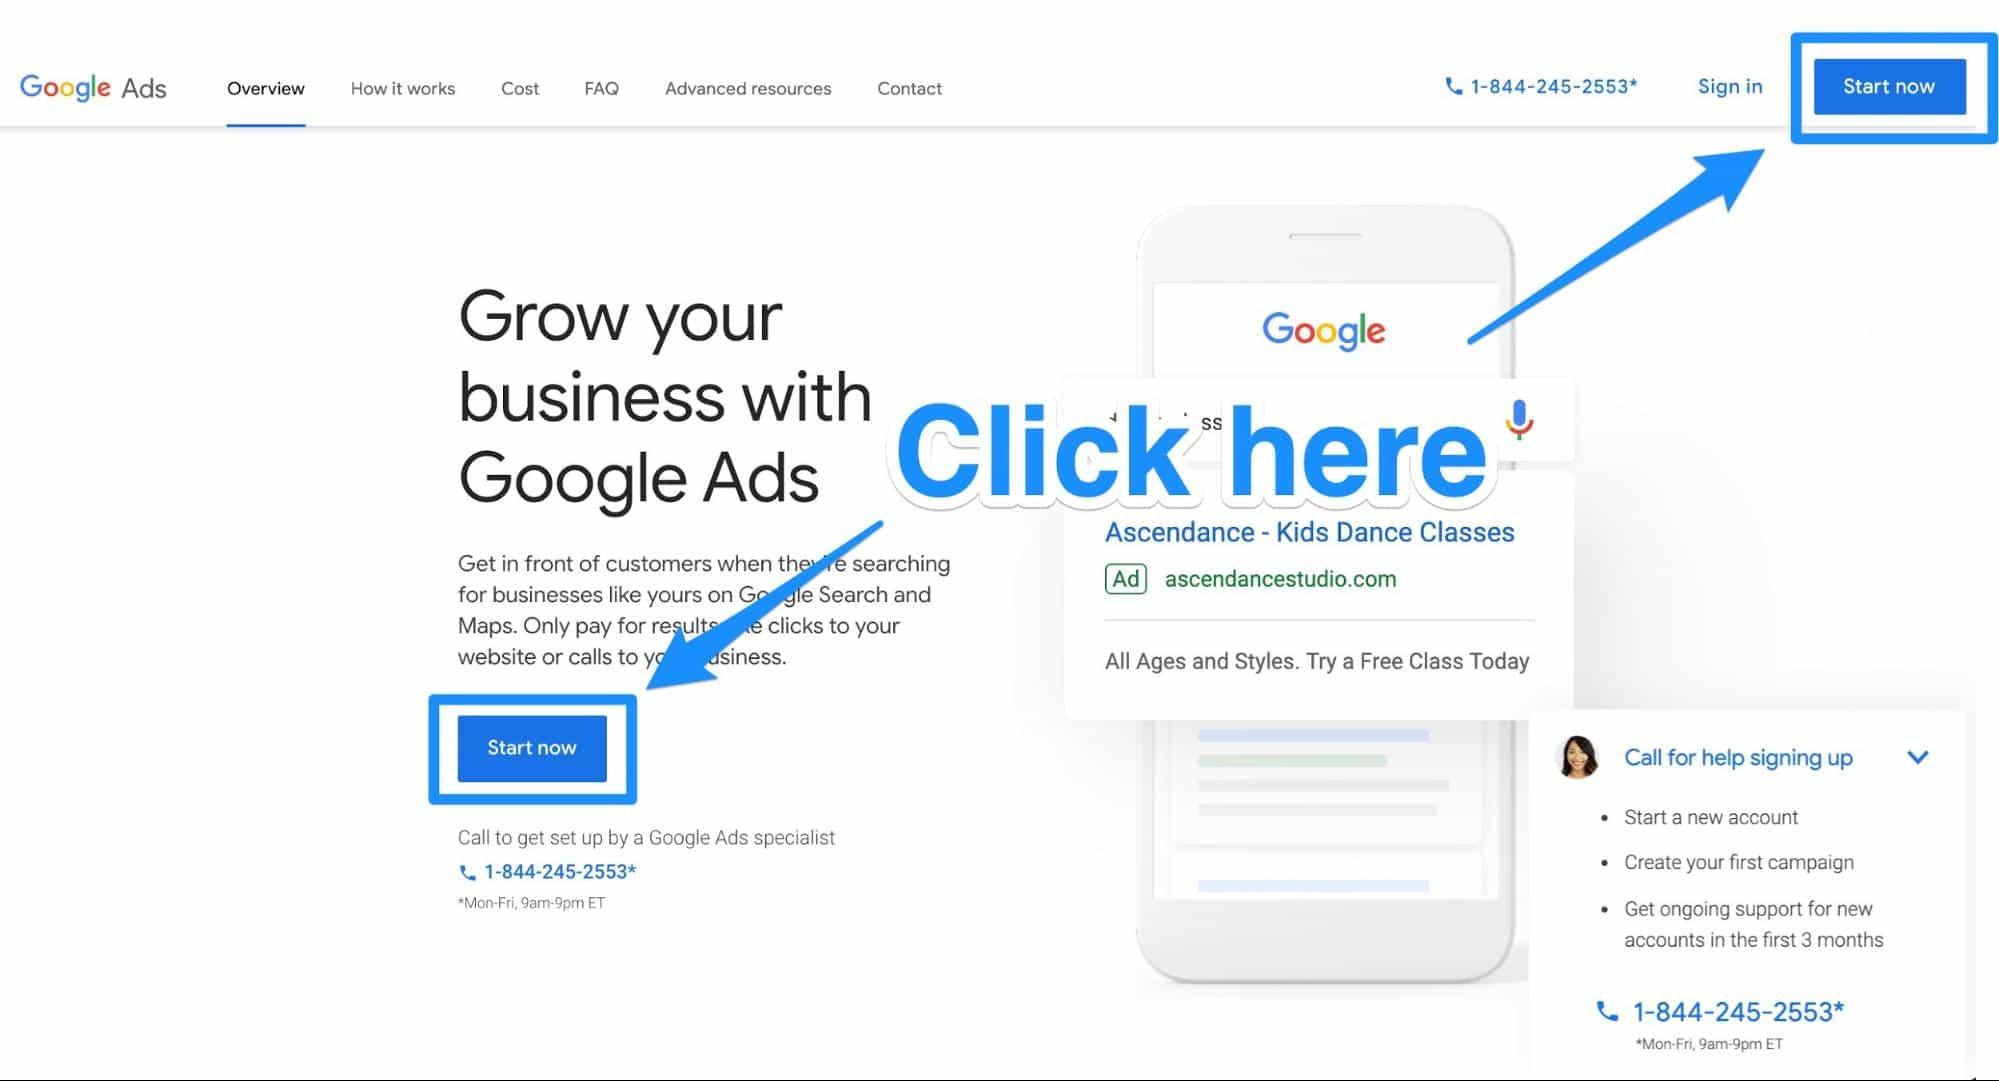 Google Ads homepage Start Now button